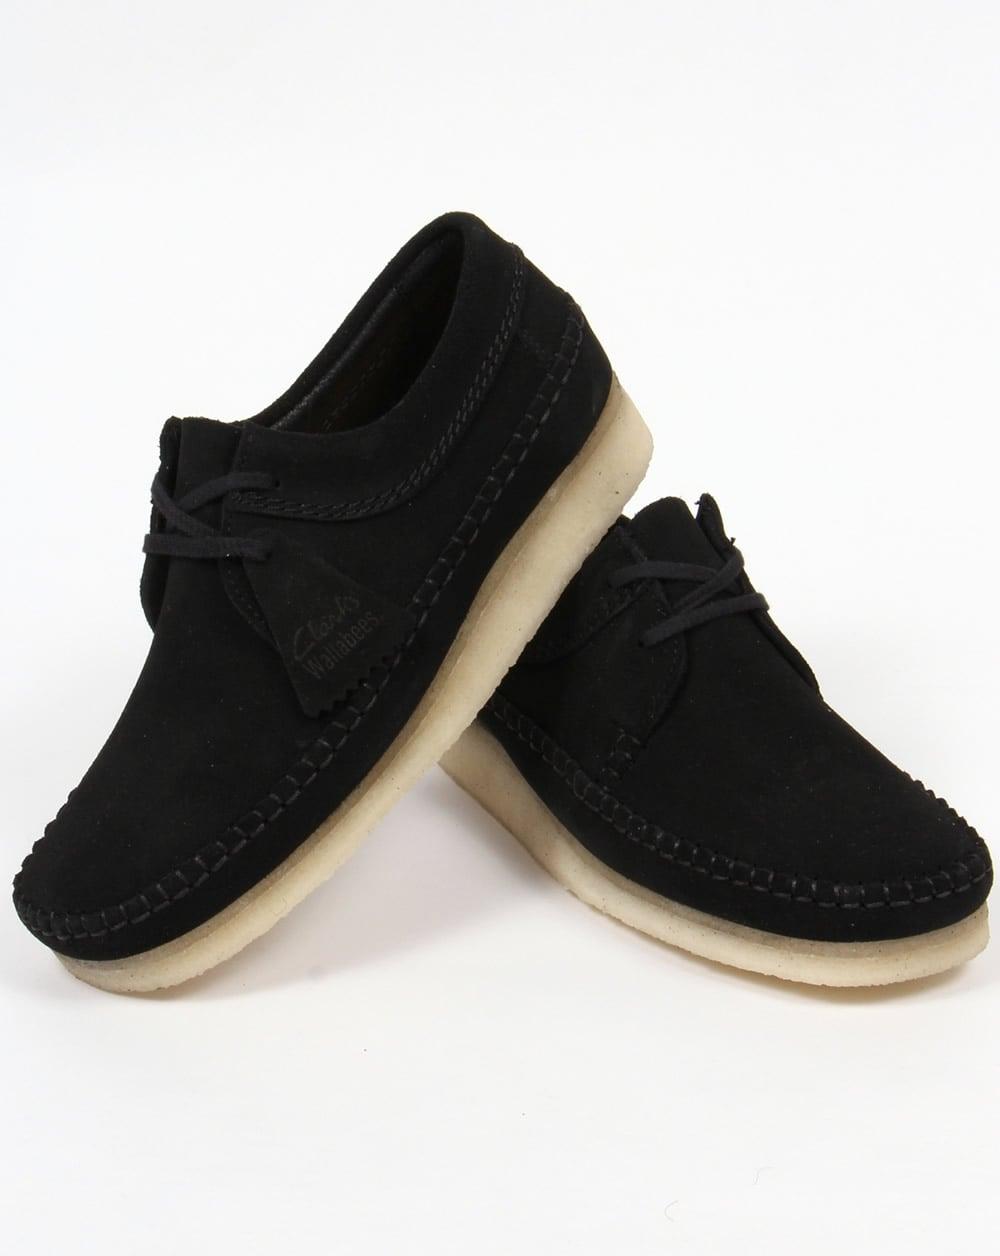 Non Leather Black Shoes